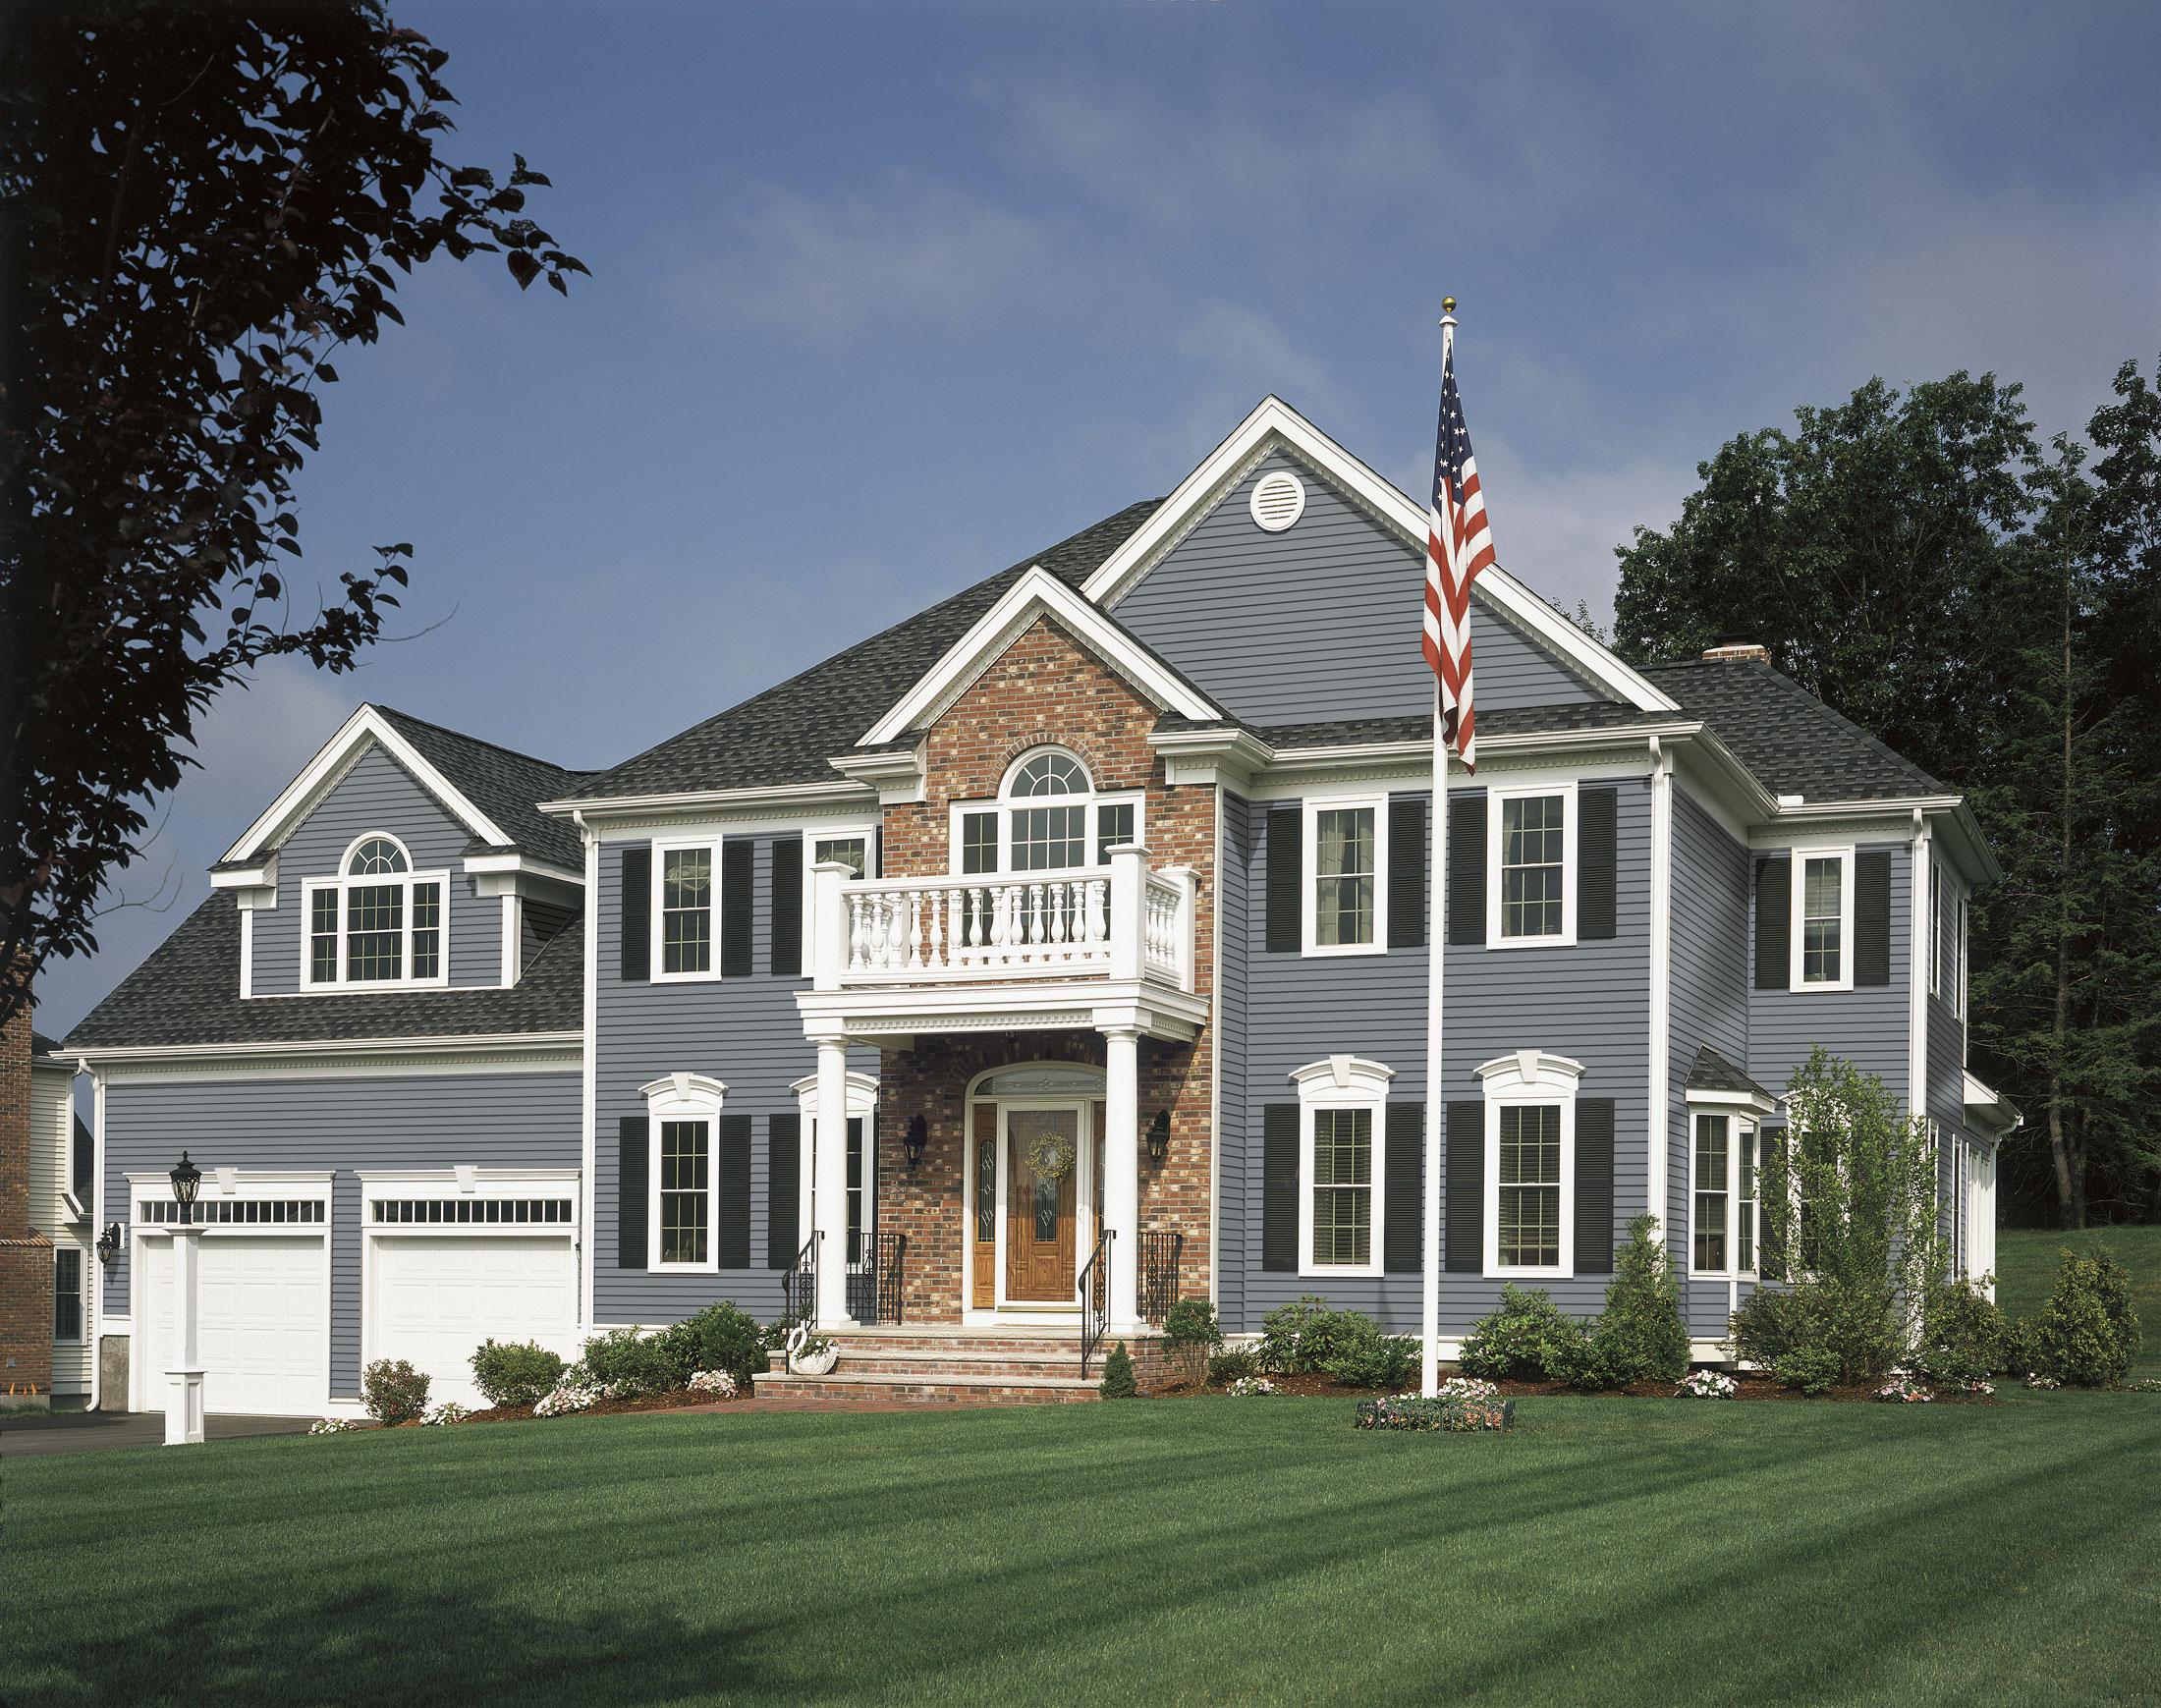 Virginia roofing siding company siding for Siding color